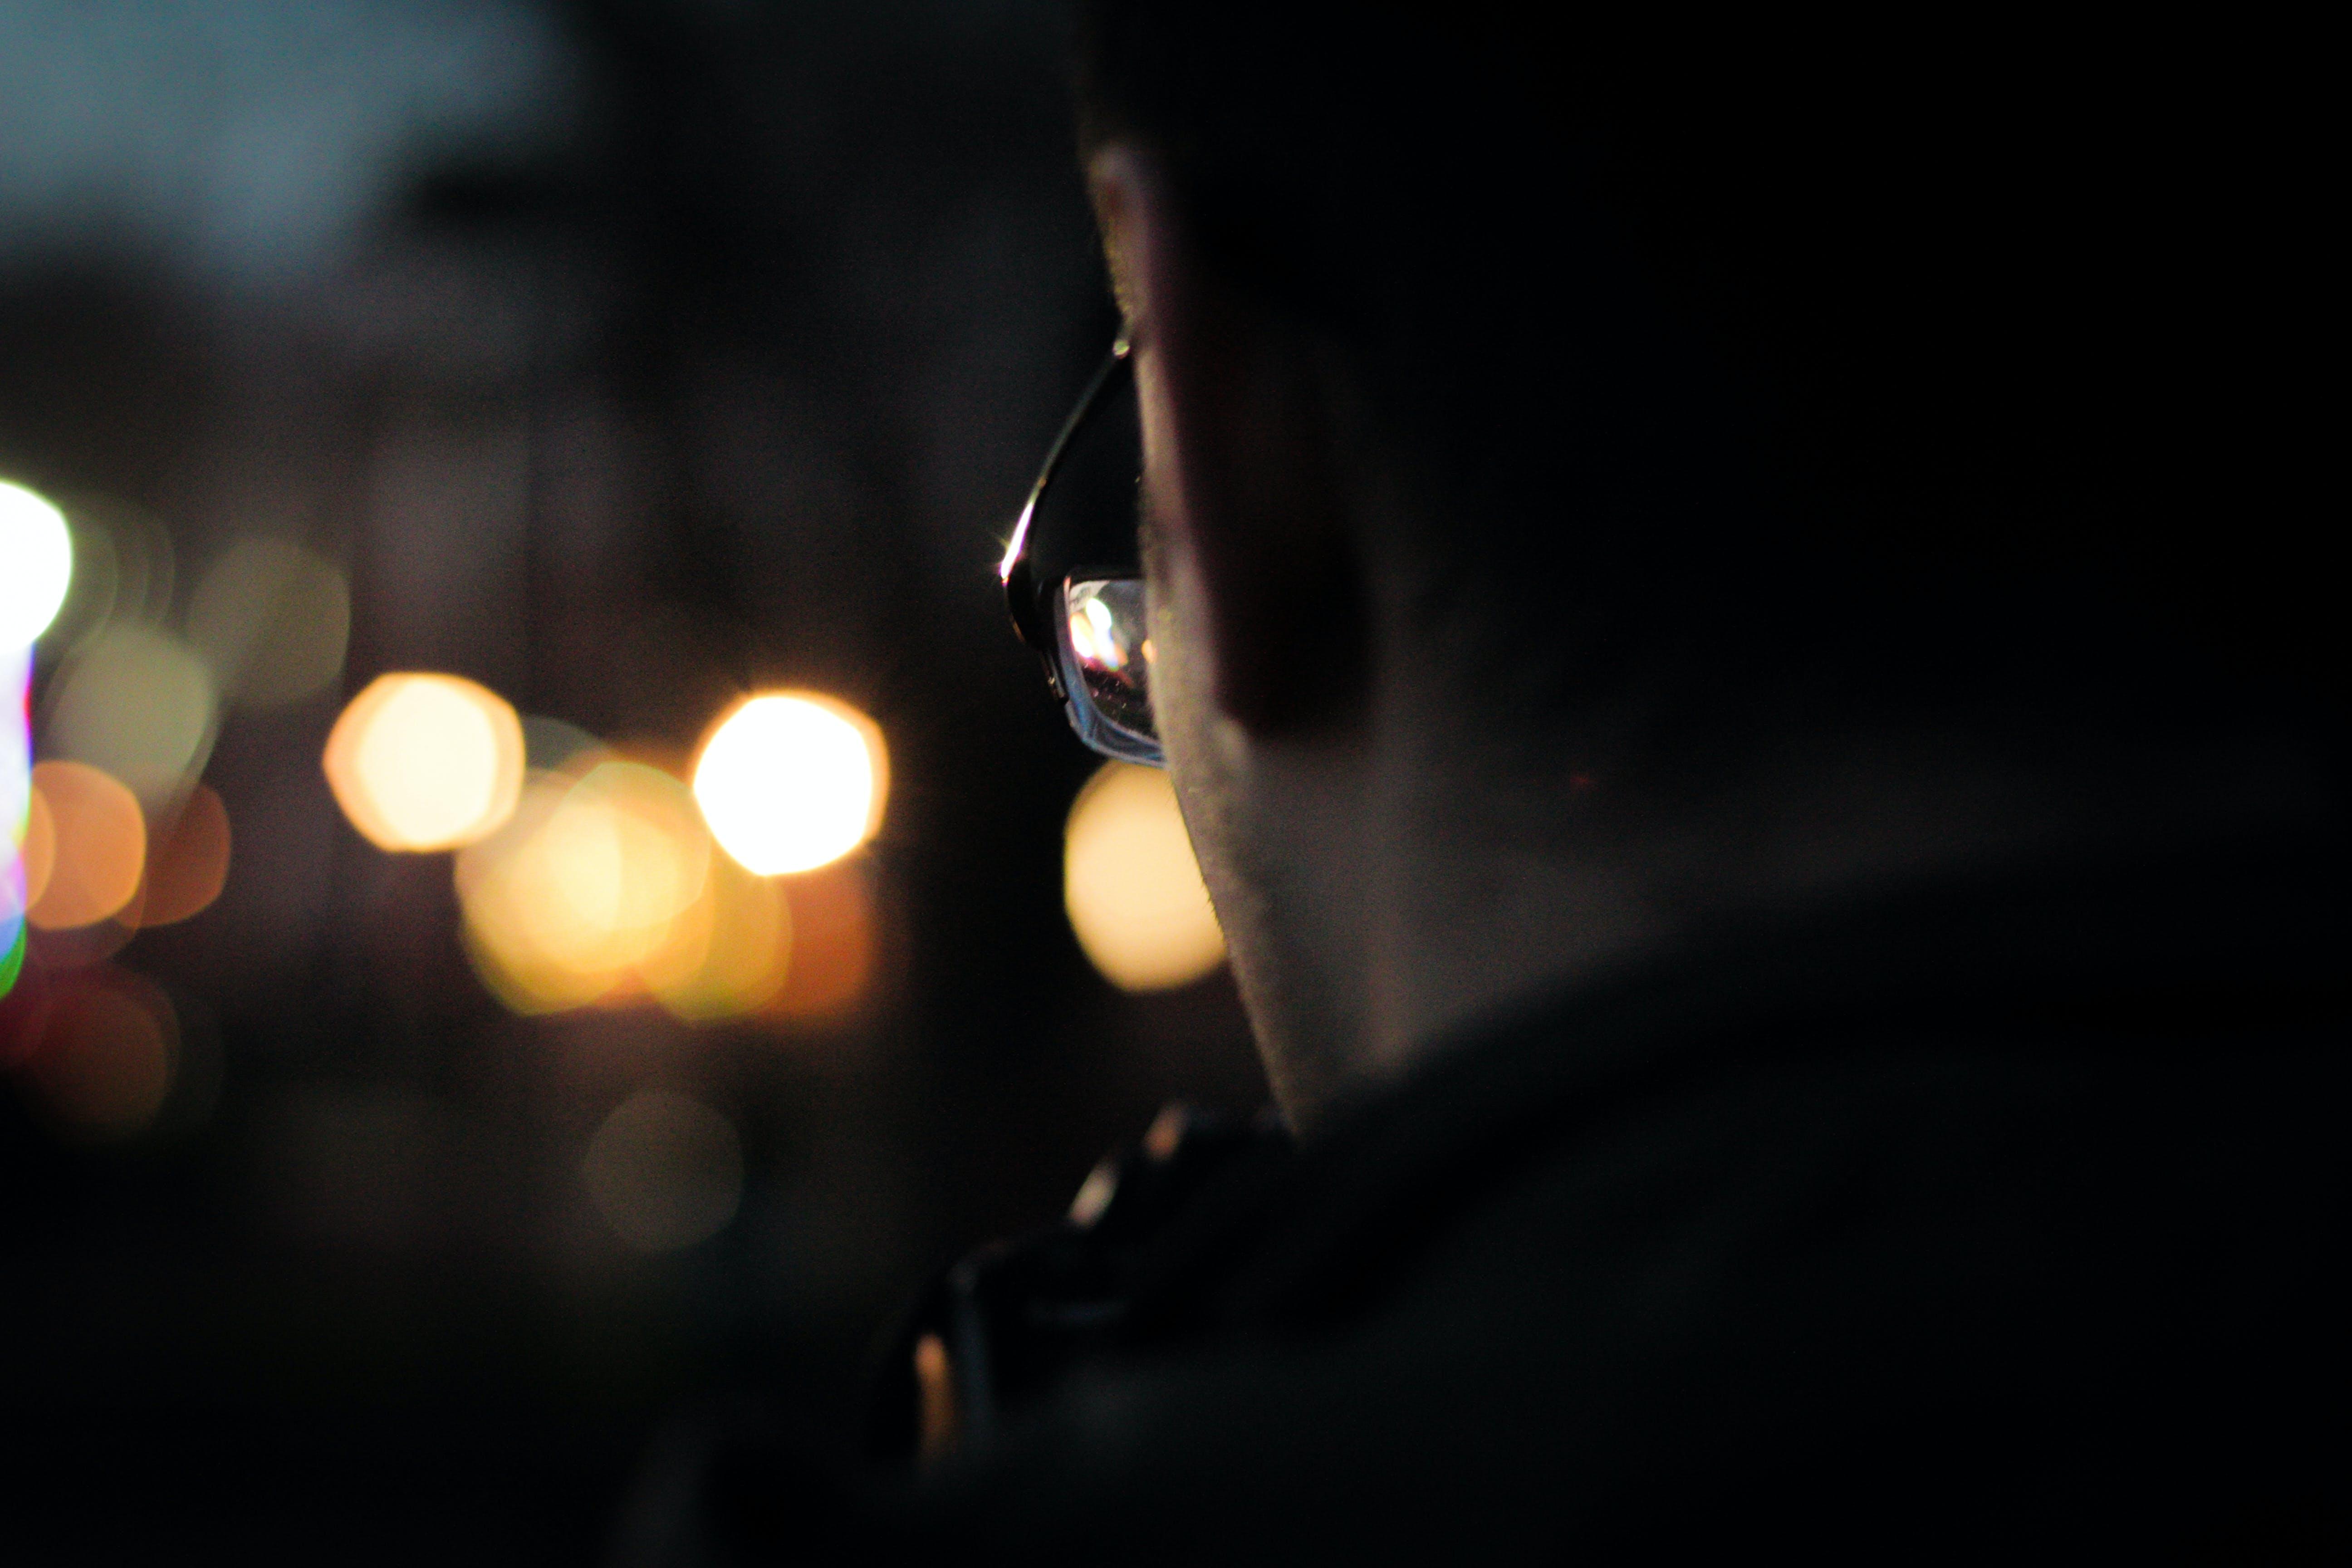 Man Wearing Black Framed Eyeglasses in Macro Photography